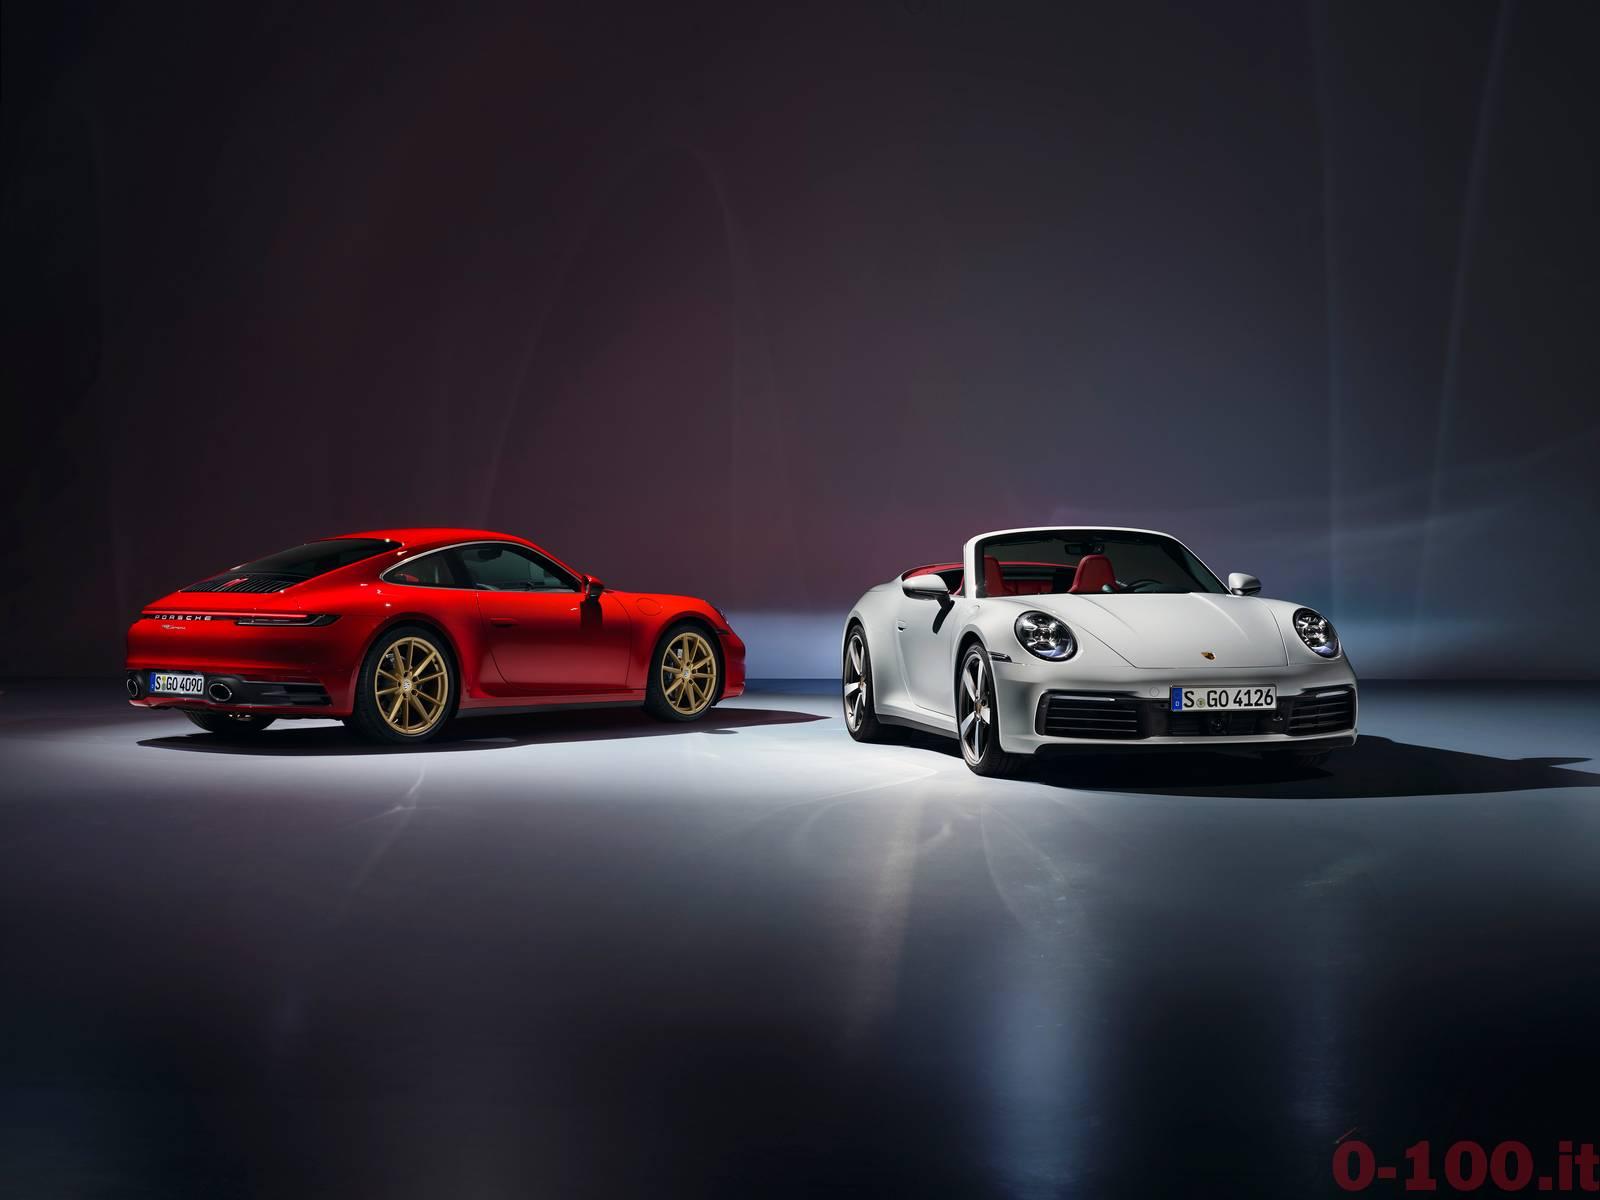 Porsche_992_carrera_coupe_cabriolet_iaa_frankfurt_2019_0-100_1